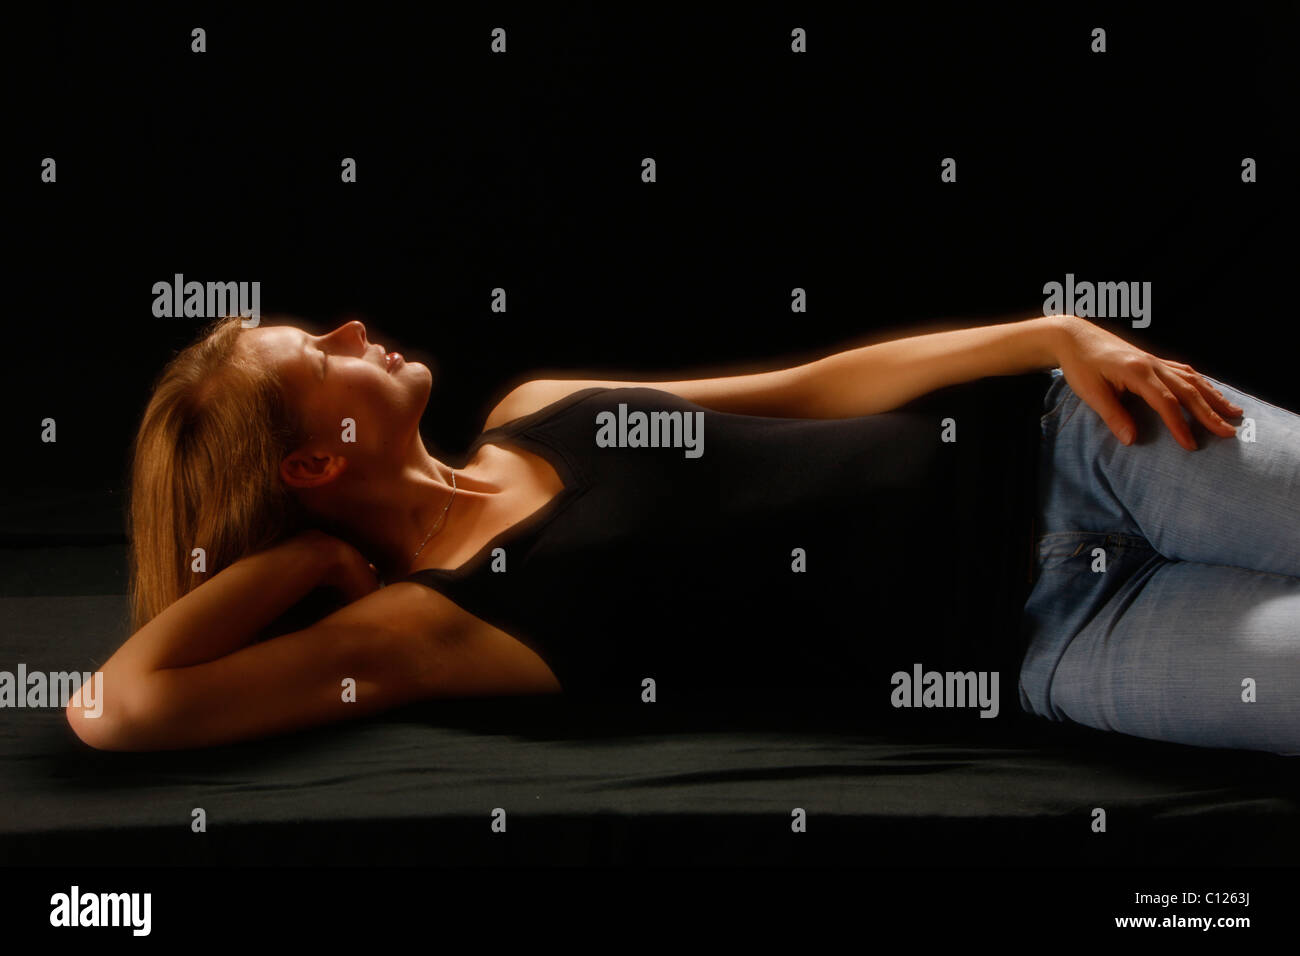 Young woman lying - Stock Image